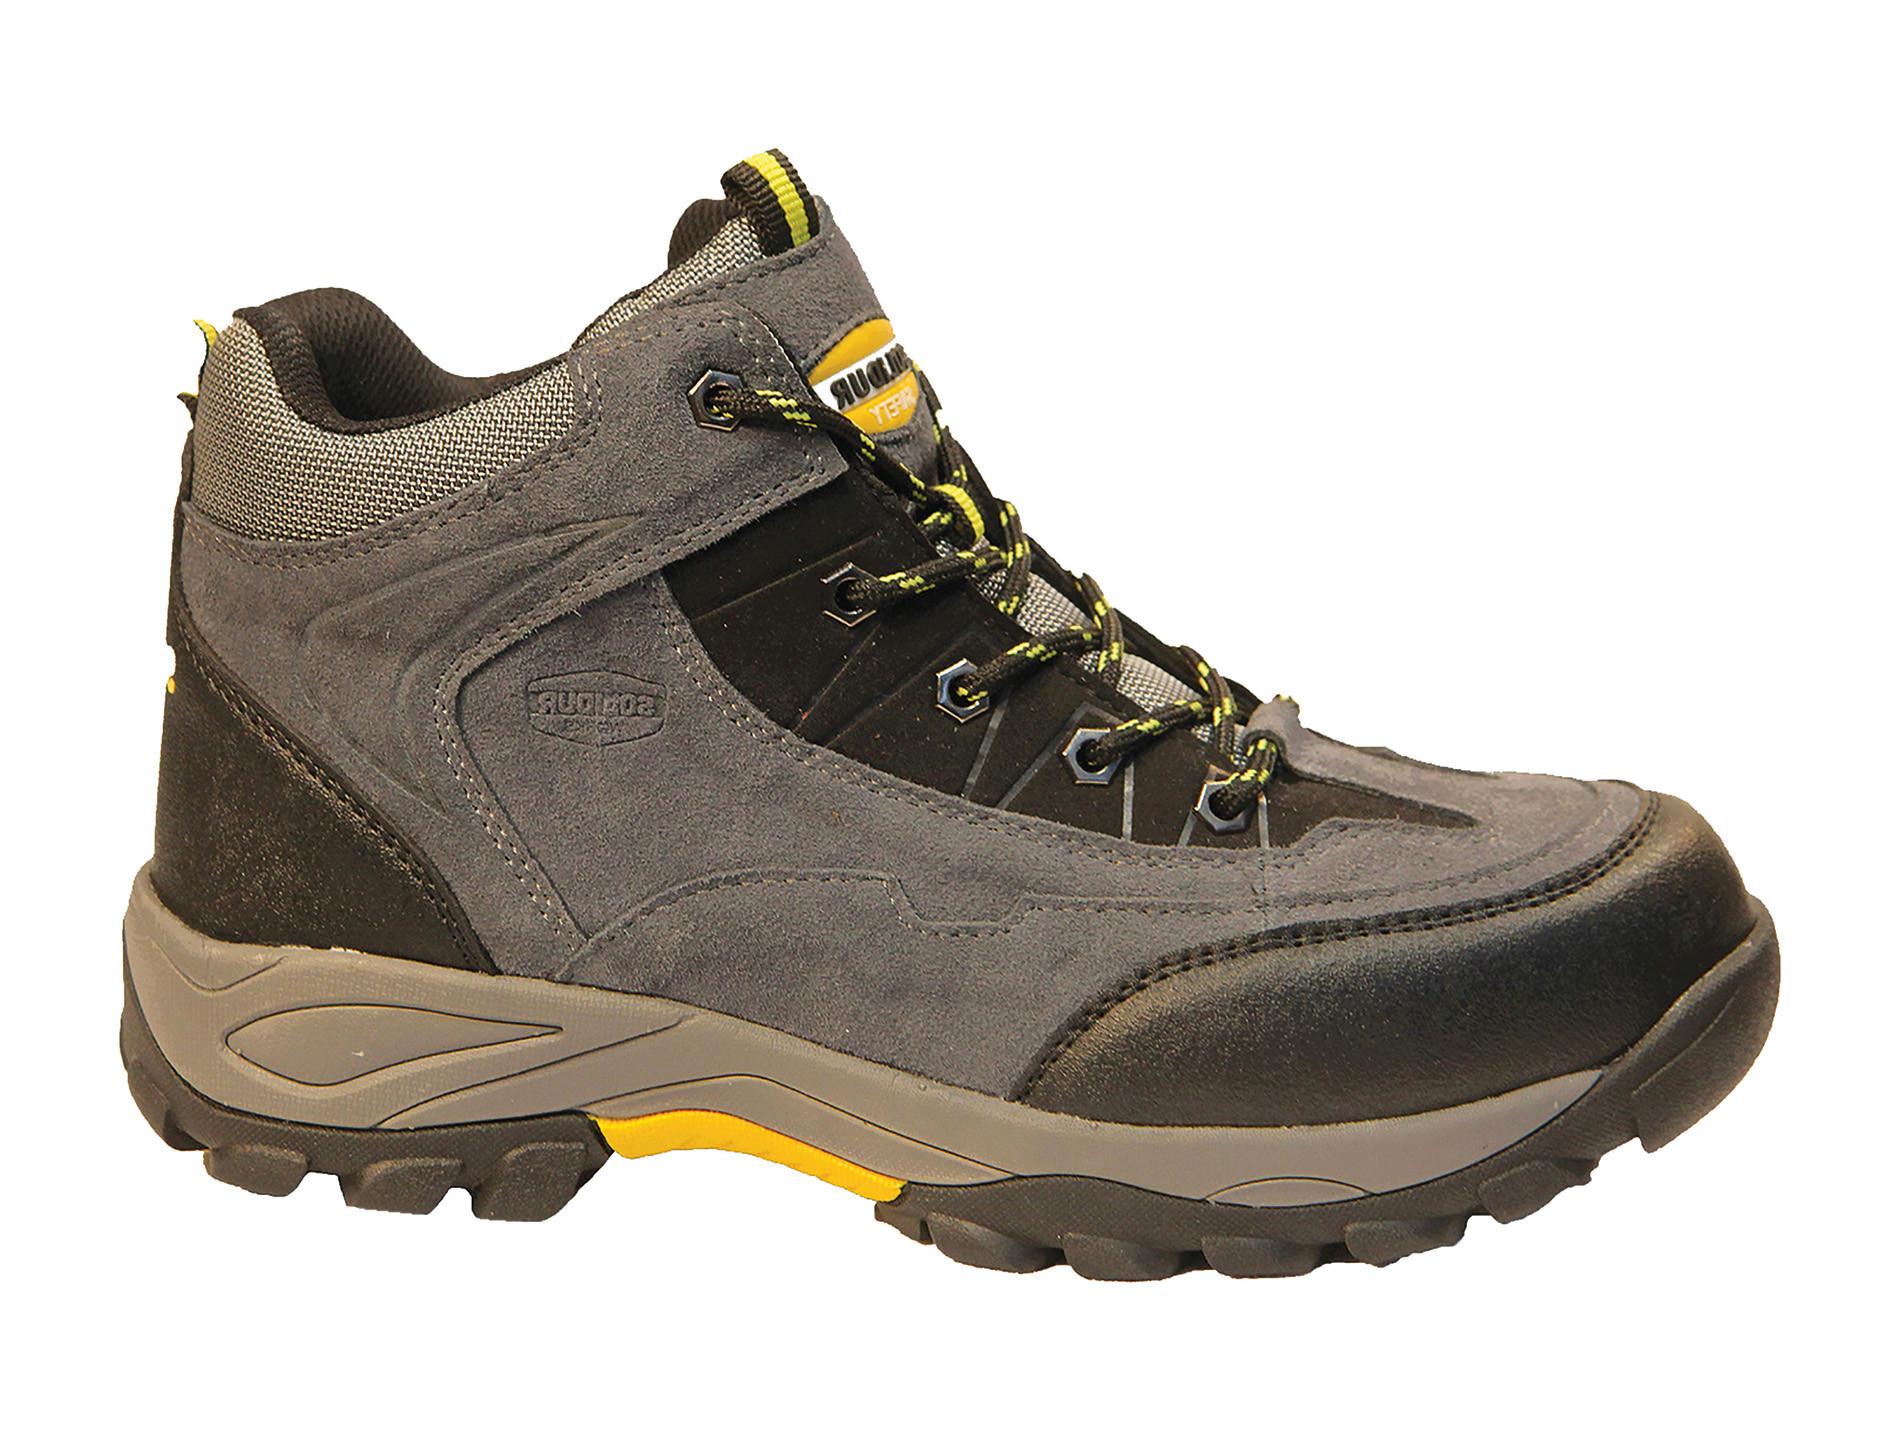 Chaussures de travail hautes SOLIDUR Chara